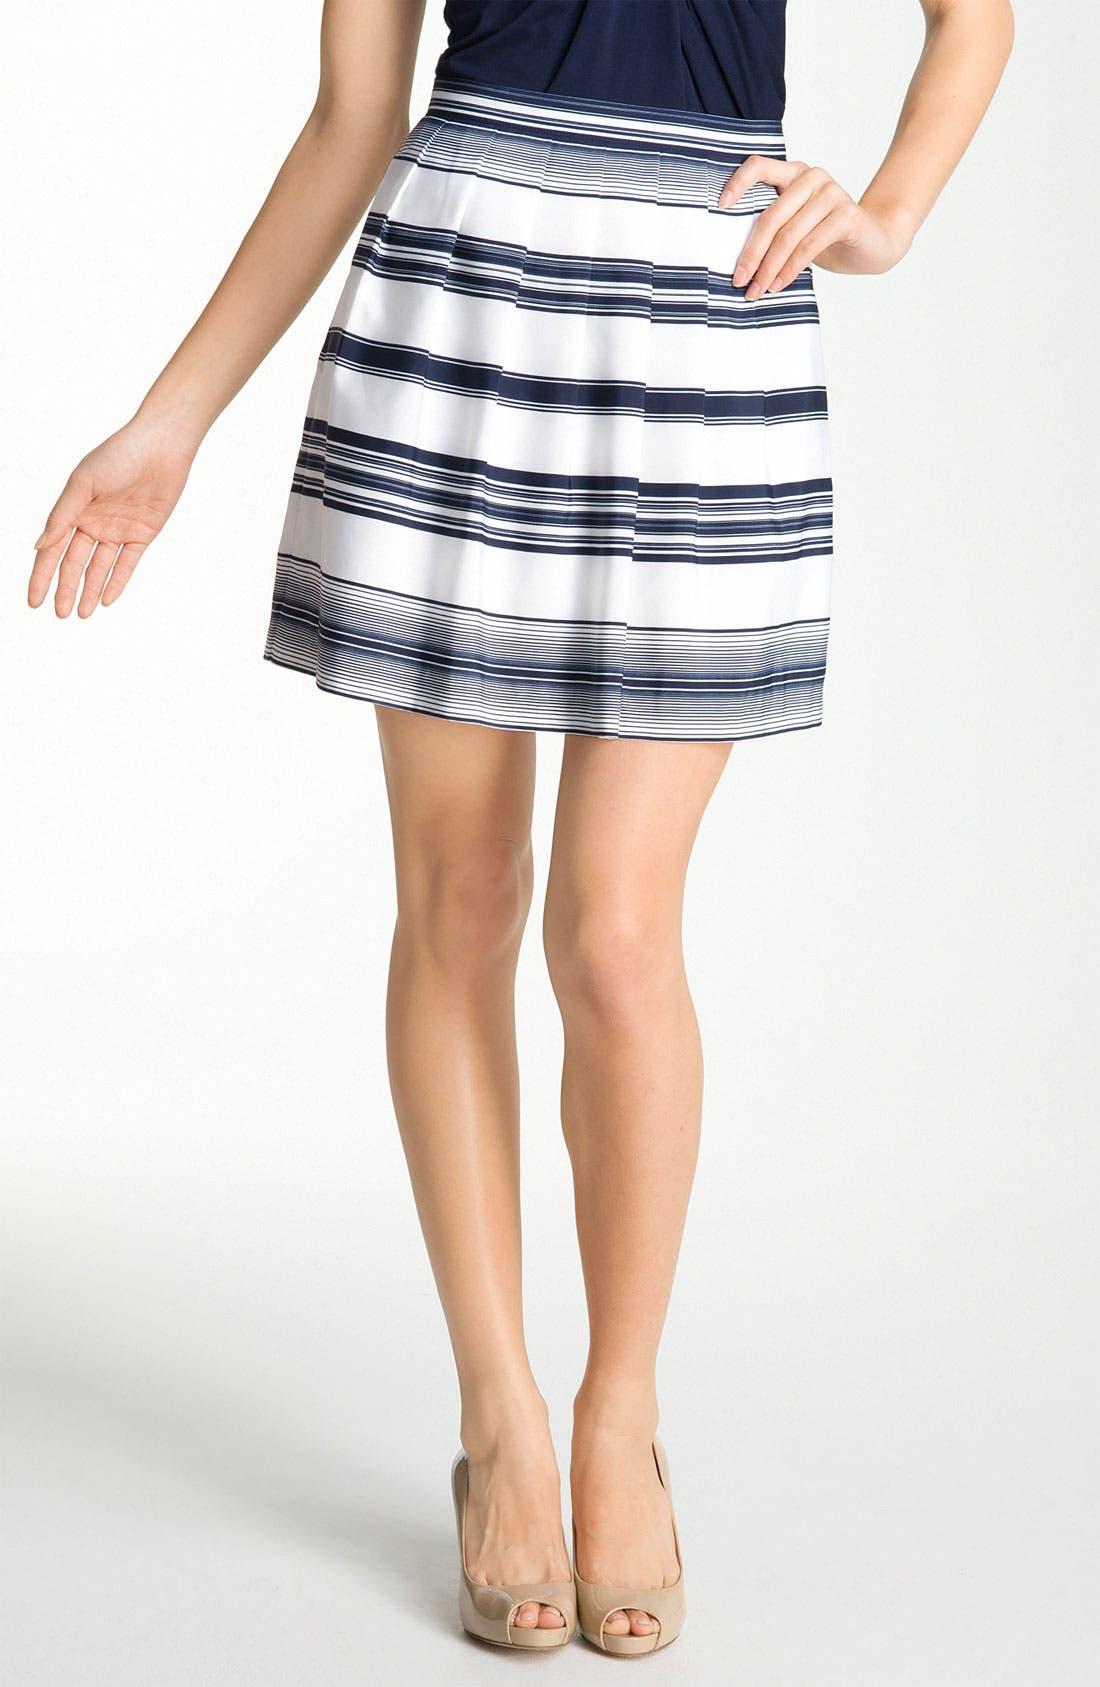 Alternate Image 1 Selected - Vince Camuto 'Caribbean Stripe' Skirt (Petite)